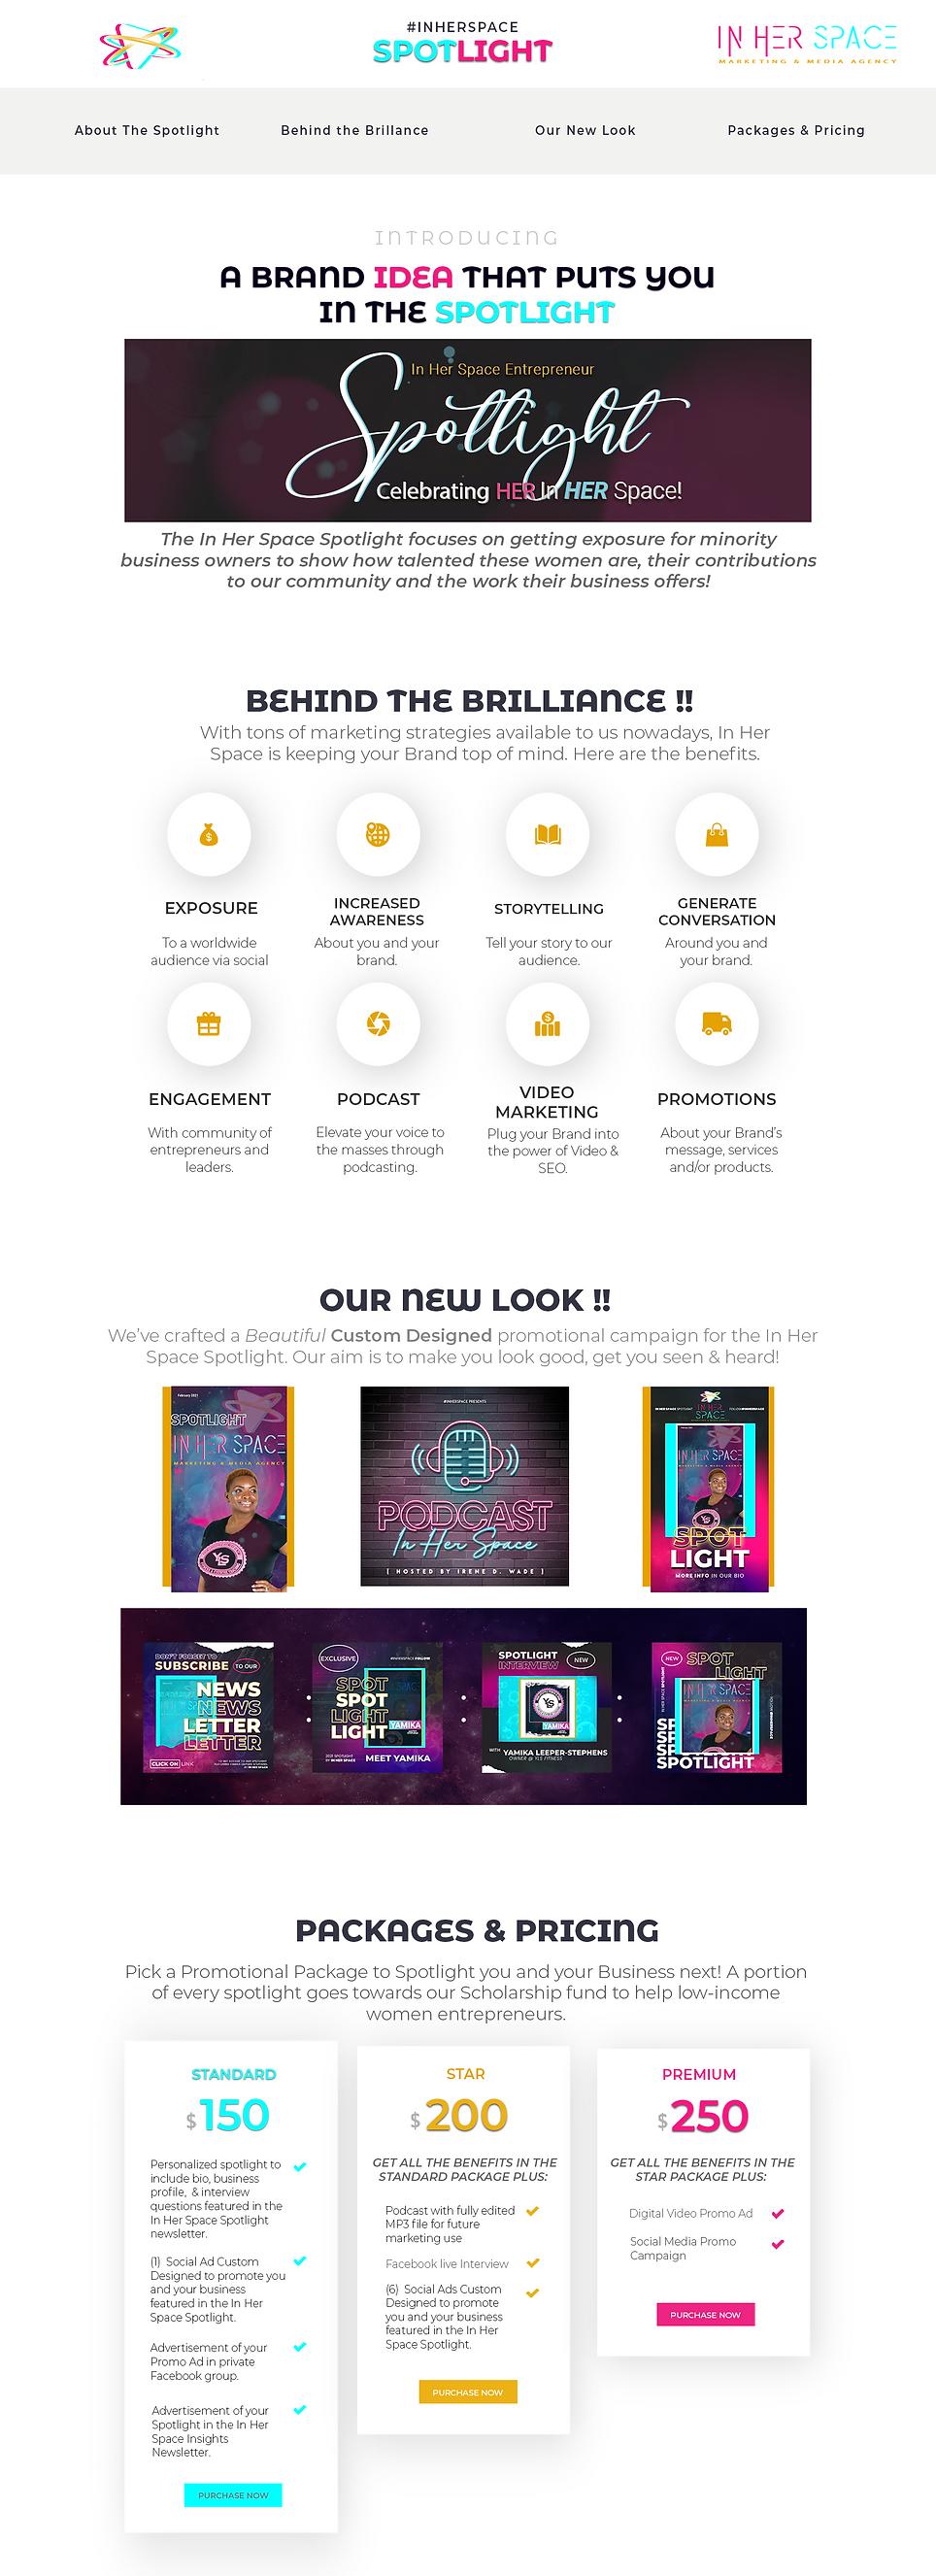 IRENE_spotlight sales page Newsletter 2.